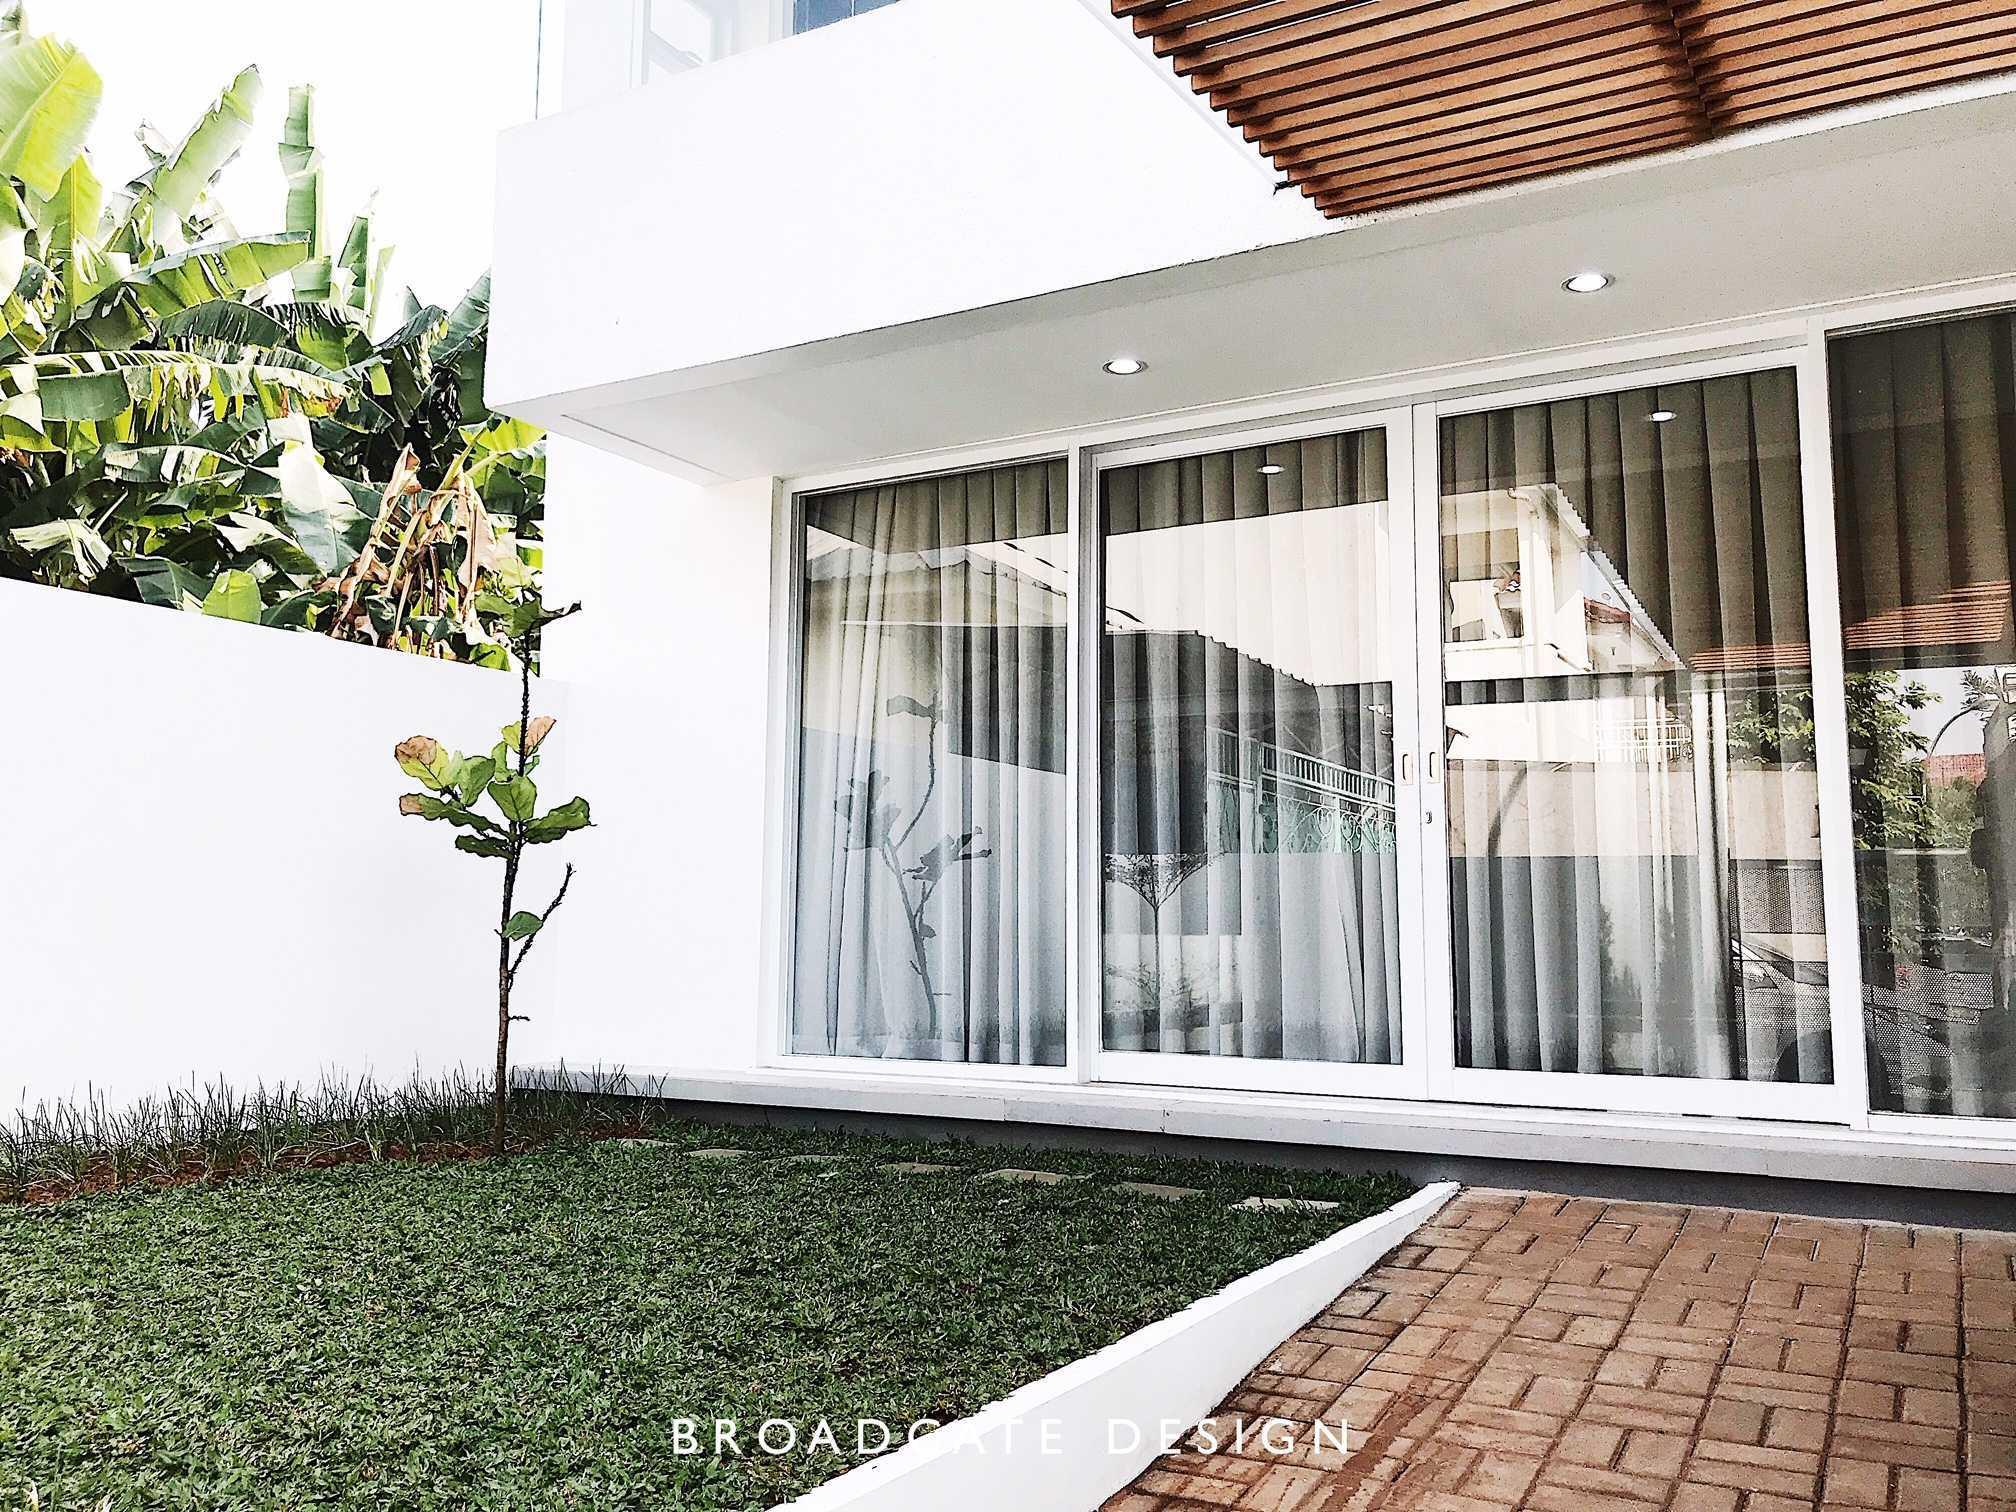 Broadgate Iv House Lippo Karawaci, Binong, Kec. Curug, Tangerang, Banten, Indonesia Lippo Karawaci, Binong, Kec. Curug, Tangerang, Banten, Indonesia Broadgate-Iv-House  74175